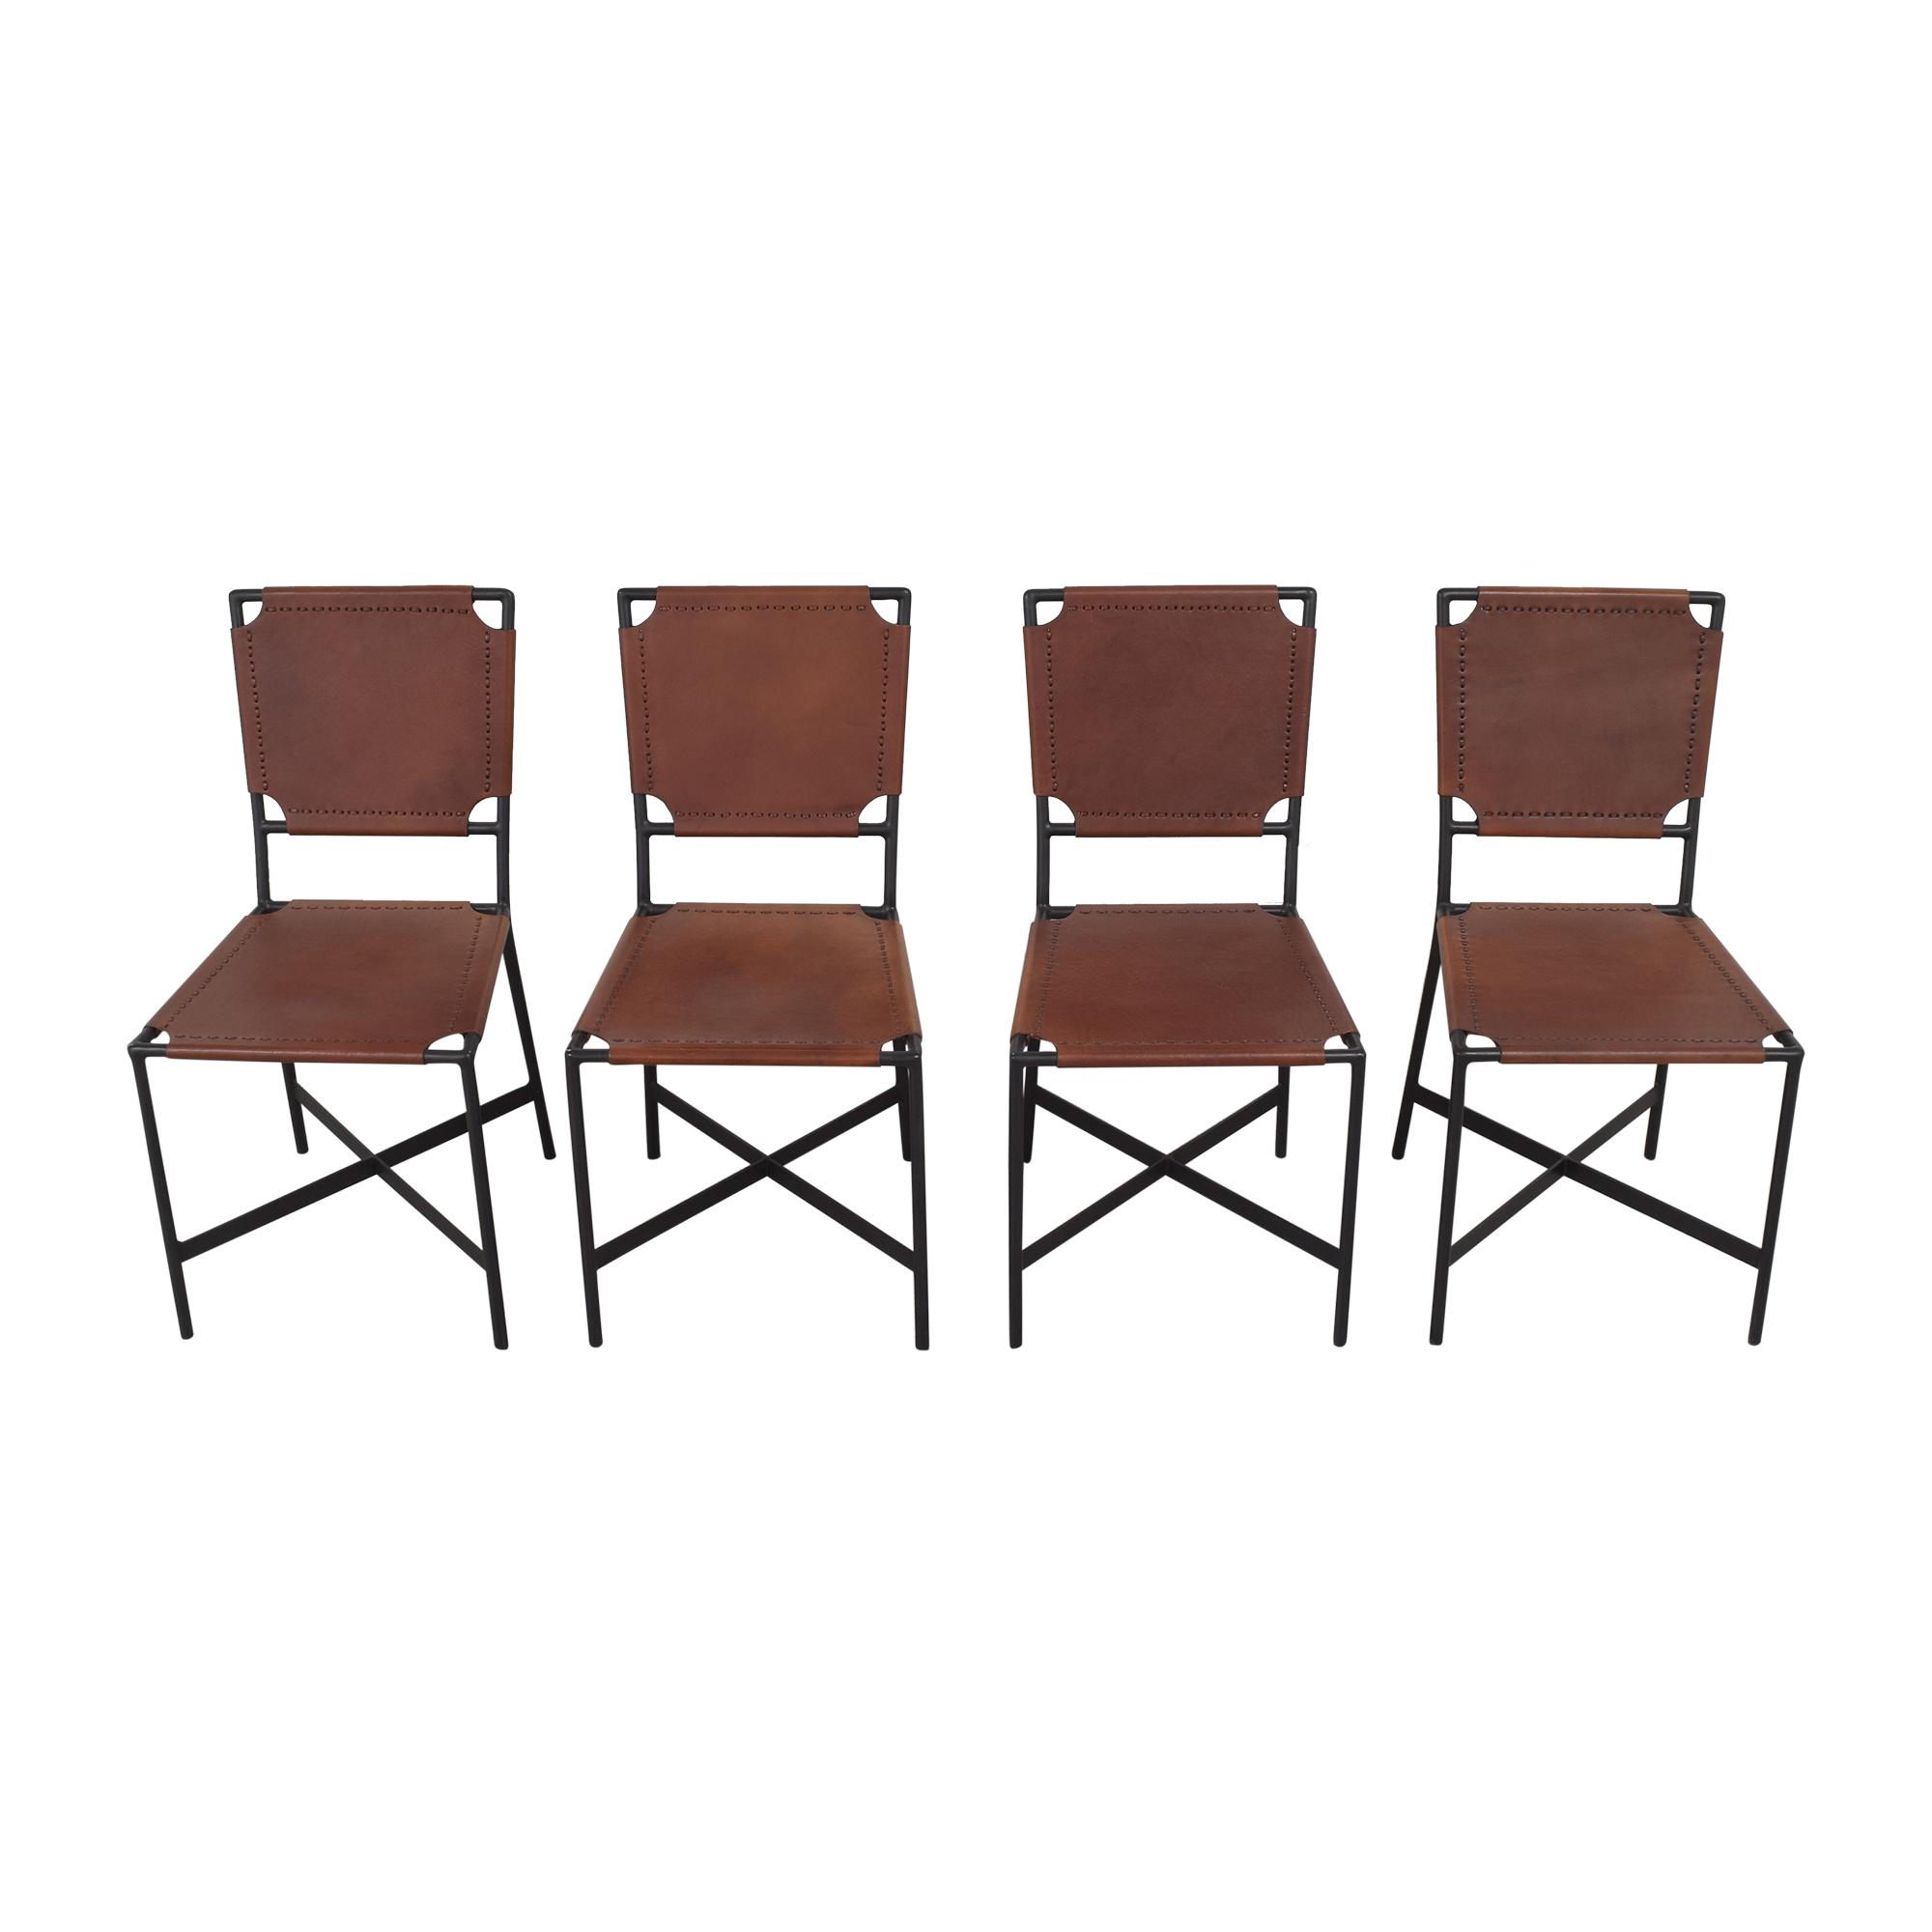 buy Crate & Barrel Crate & Barrel Laredo Dining Chairs online